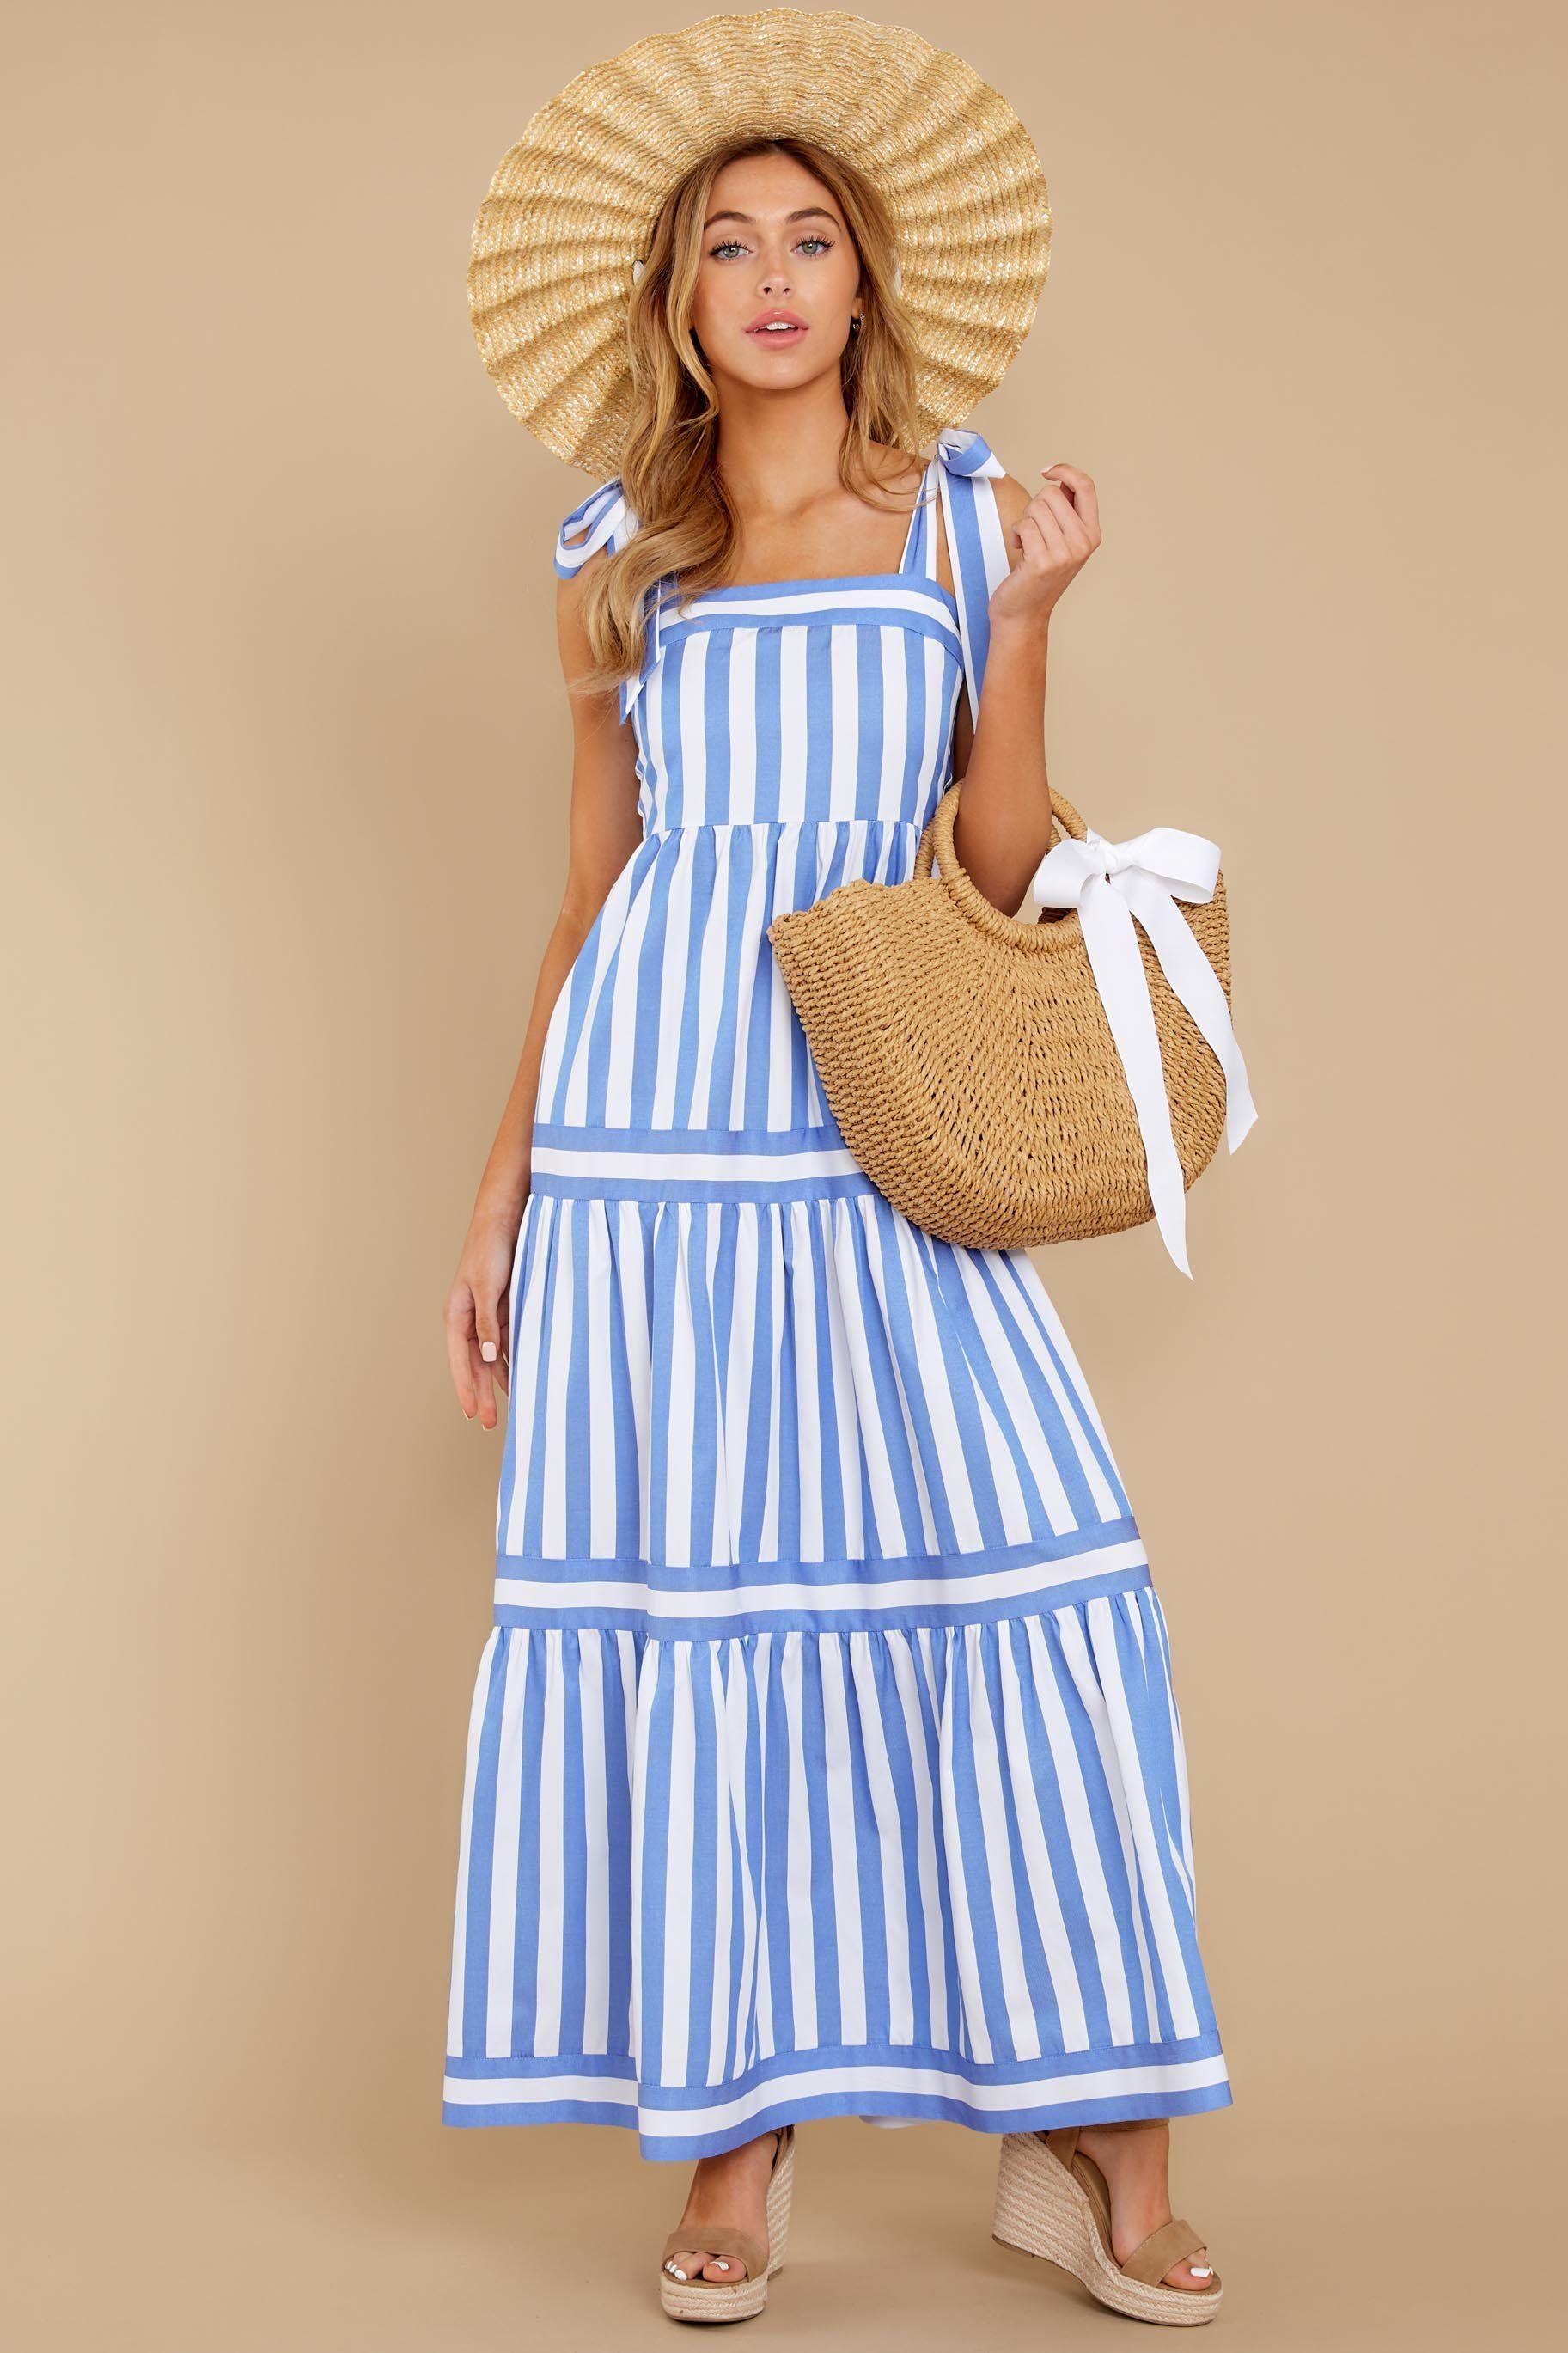 I M With You Blue Stripe Maxi Dress Backorder January 2021 Blue Striped Maxi Dress Striped Maxi Dresses Striped Maxi [ 2738 x 1825 Pixel ]